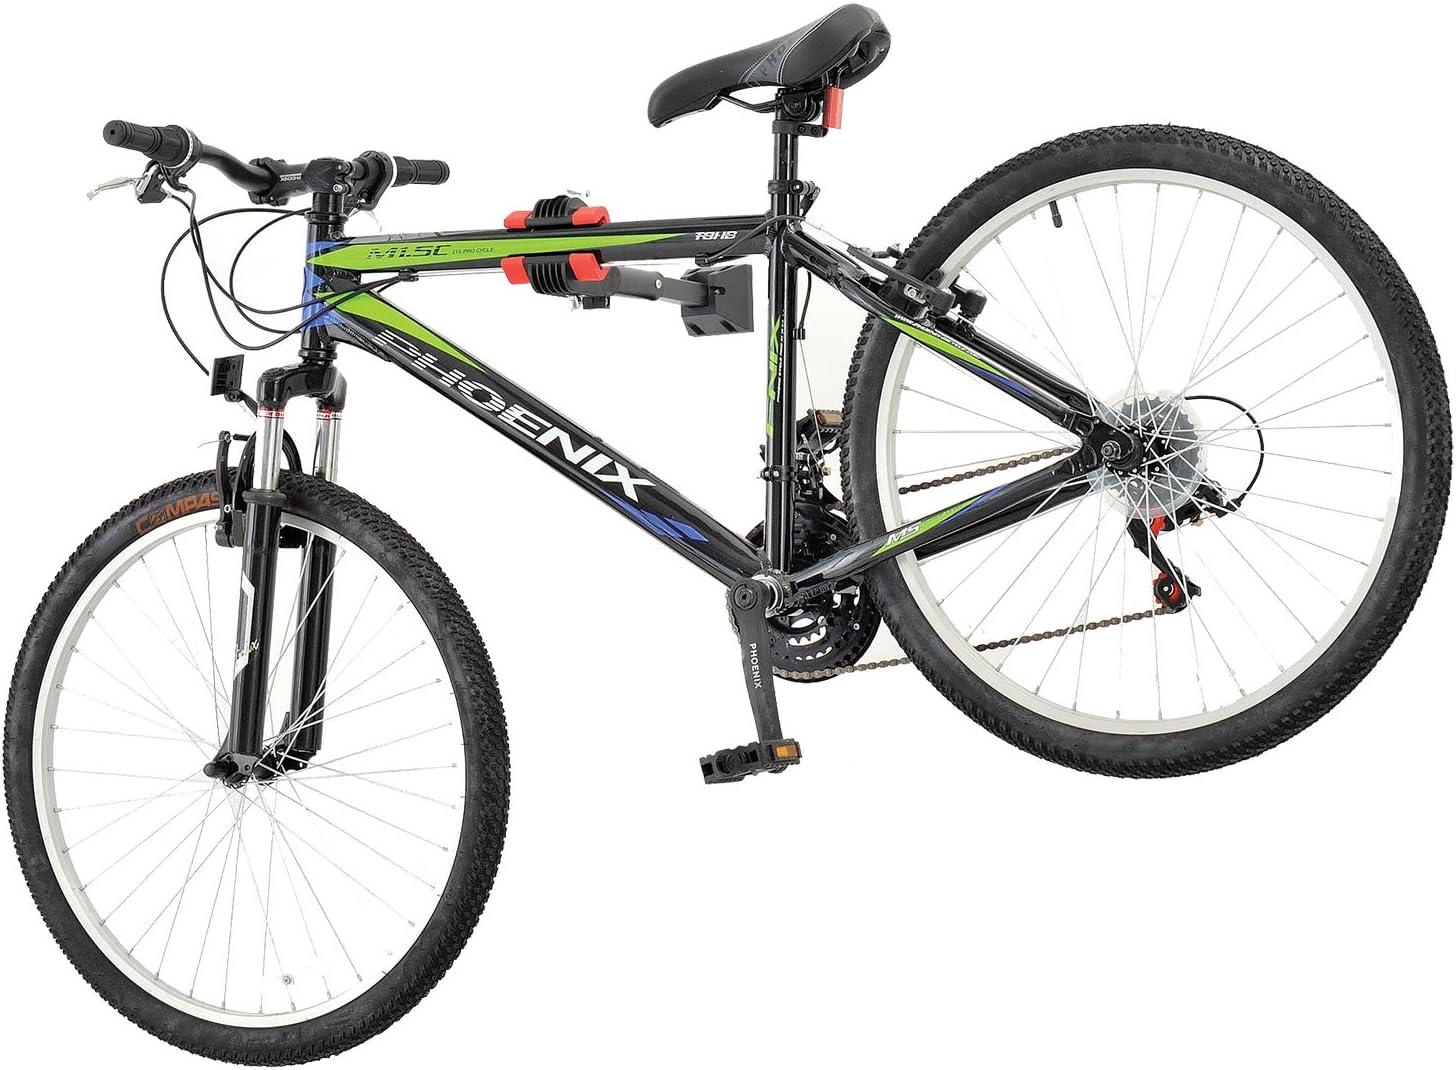 Soporte de pared resistente puregadgets © bicicleta mantenimiento ...